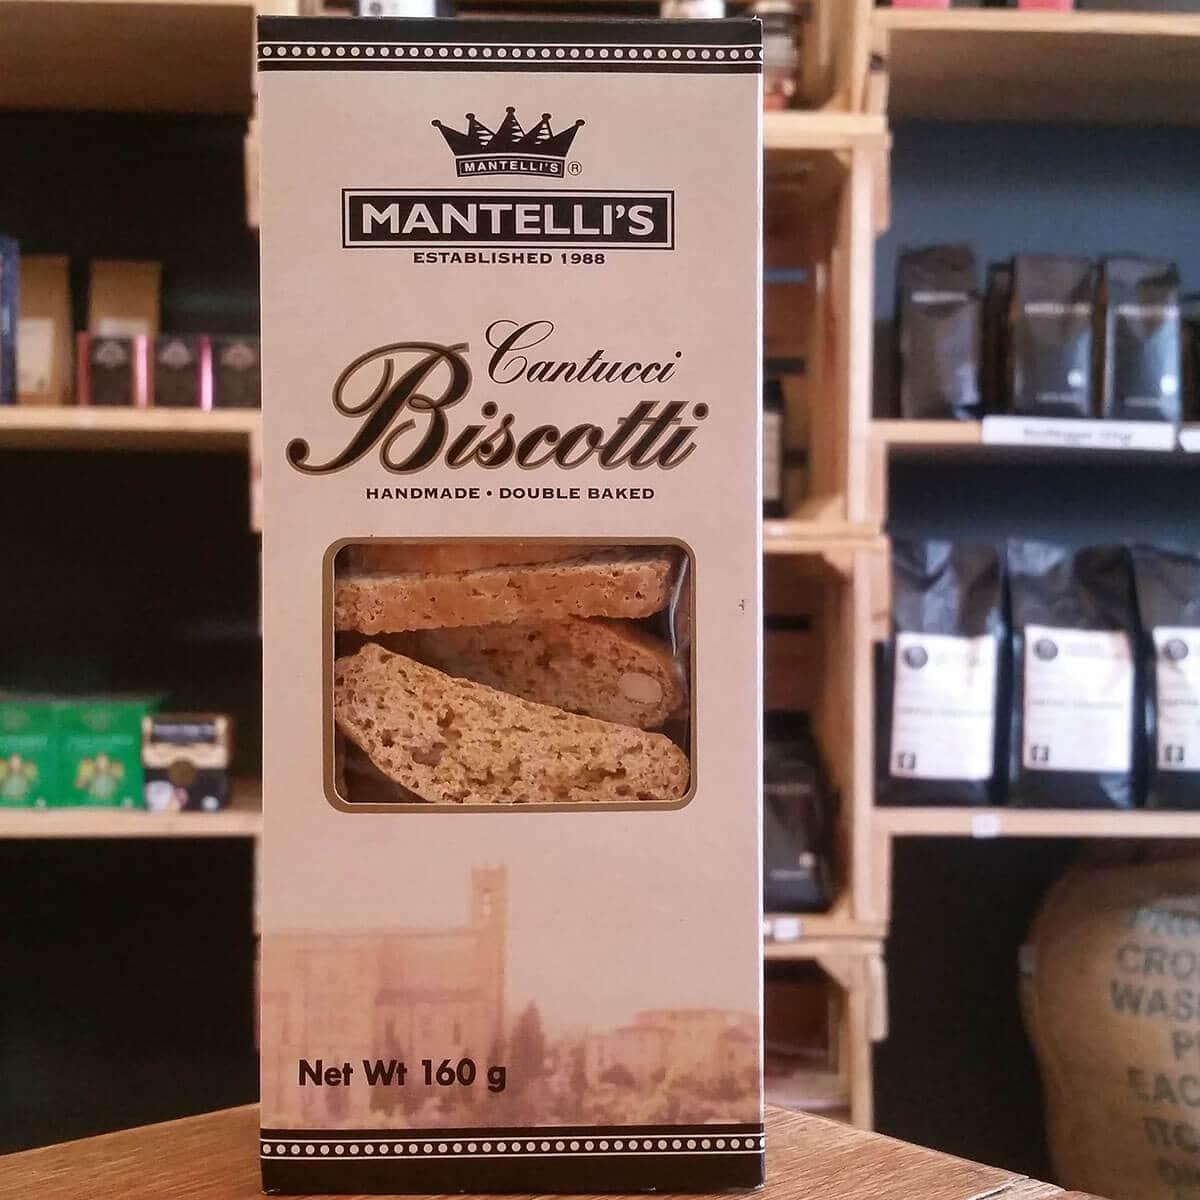 Mantelli's Cantucci Biscotti (160g)